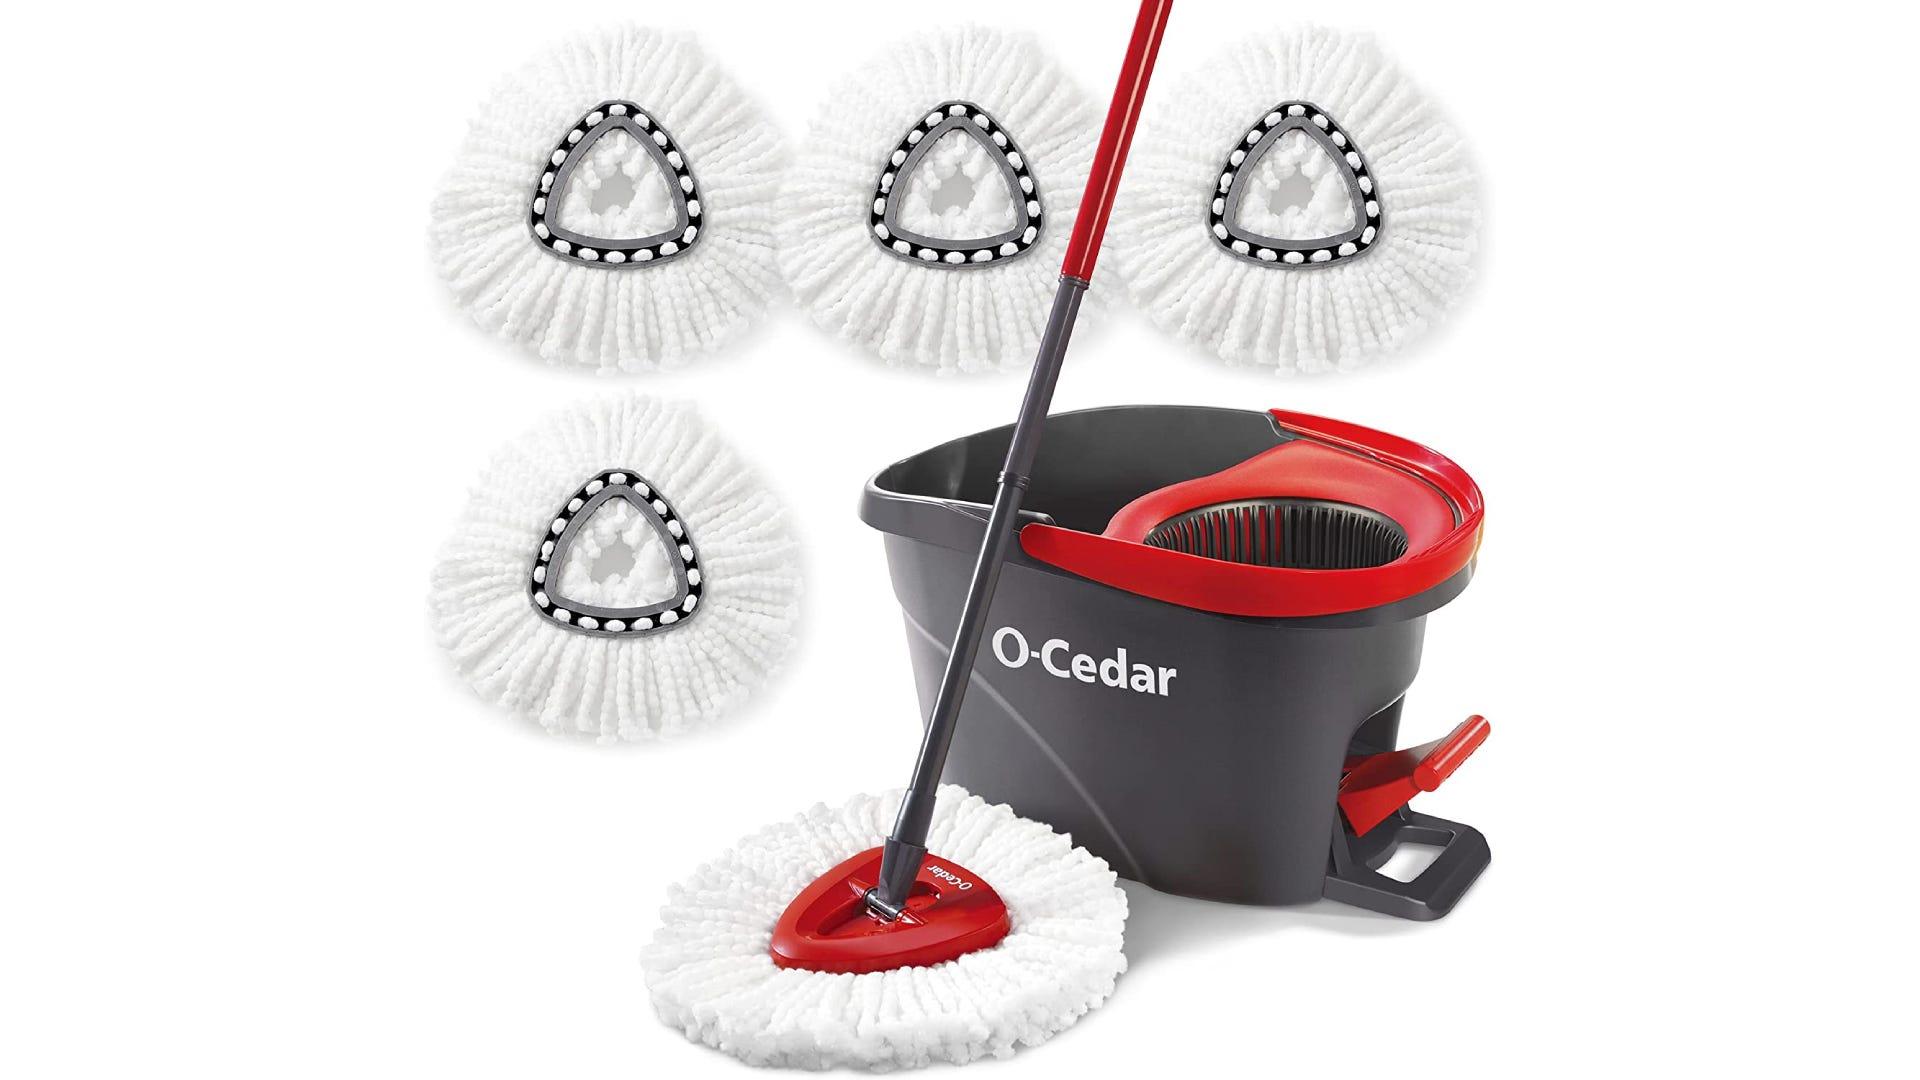 displayed black o-cedar mop bucket with spin mop